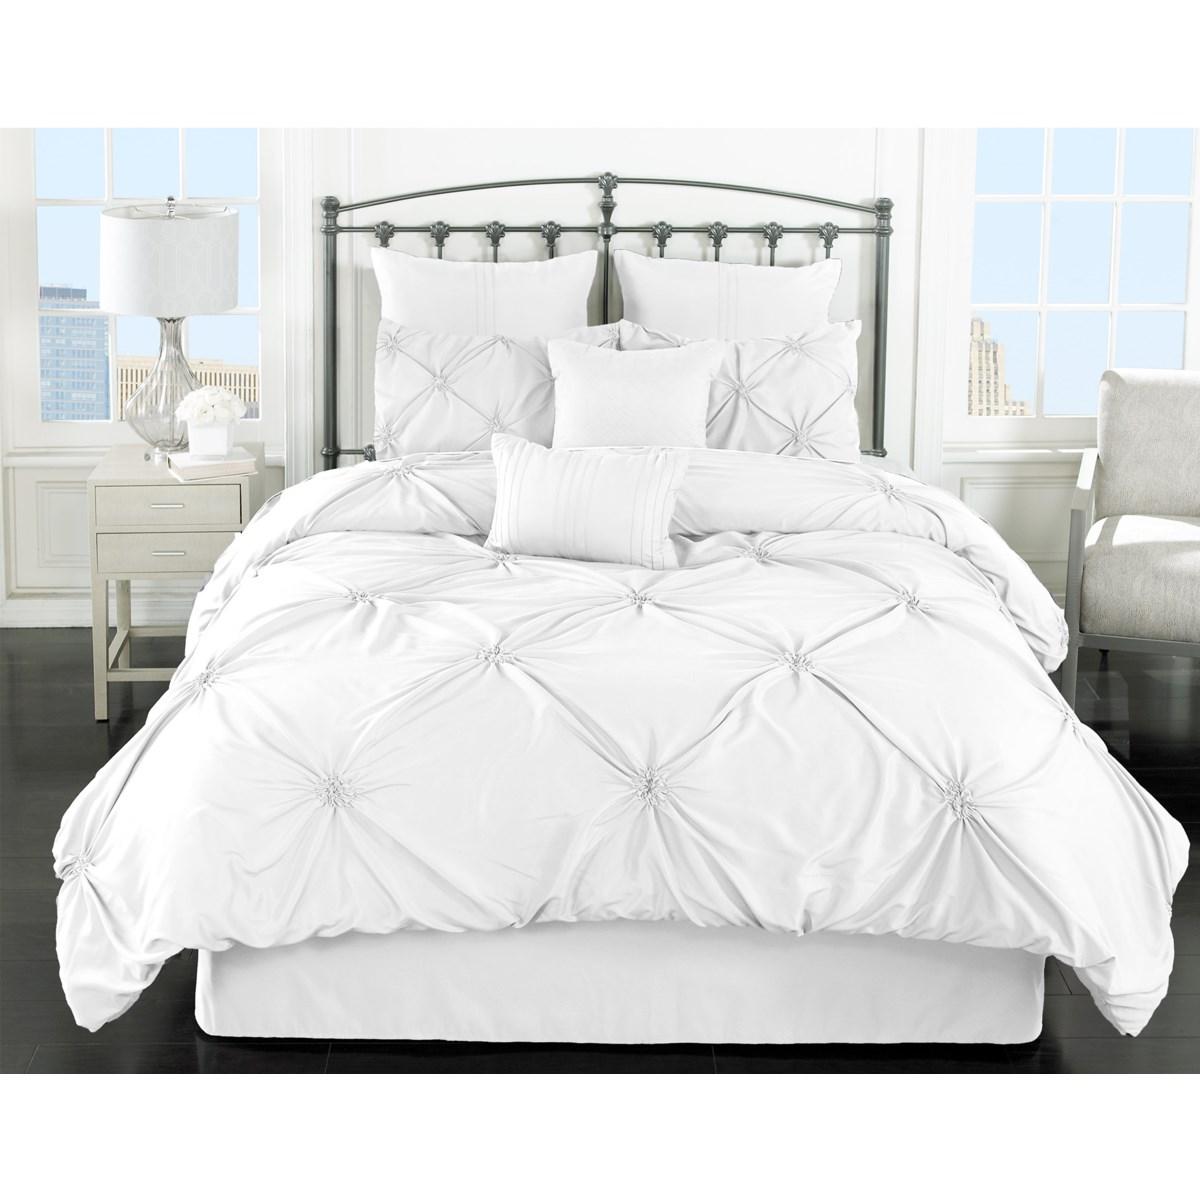 Lila White 8pc Queen Comforter Set